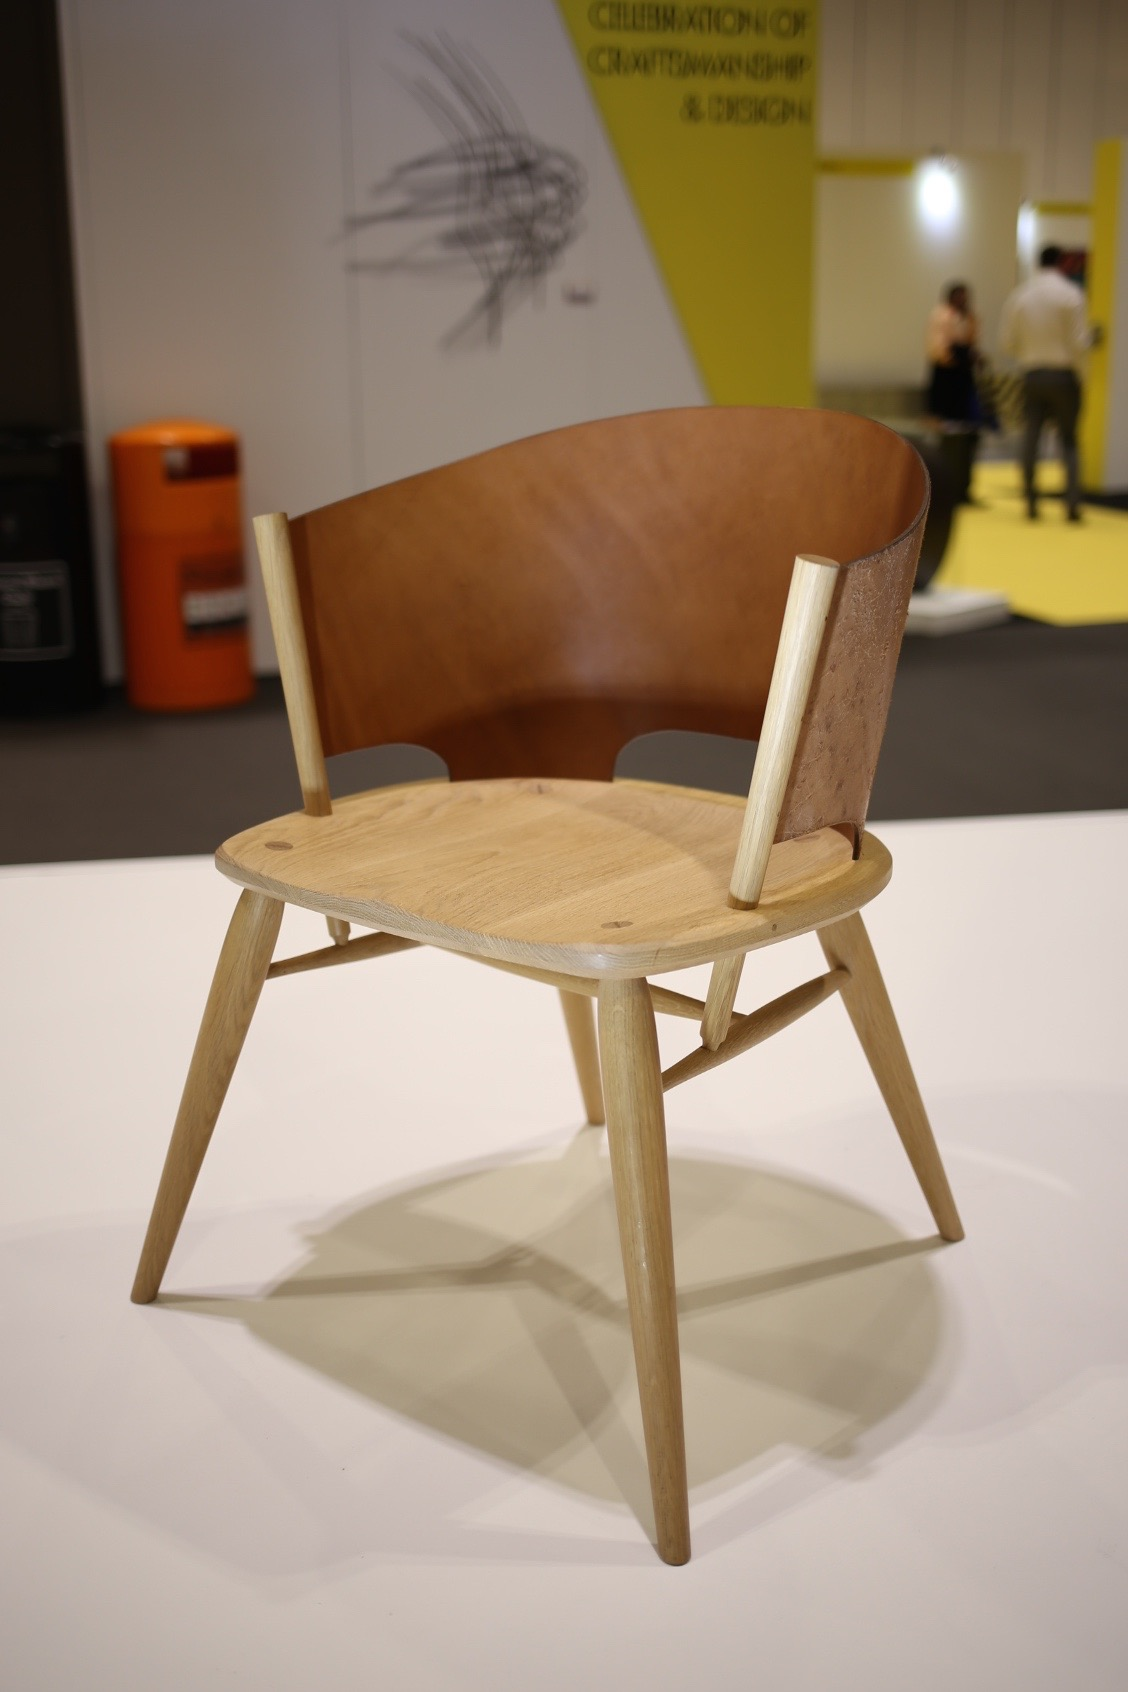 Hamylin chair by Gareth Neal - The New Craftsmen